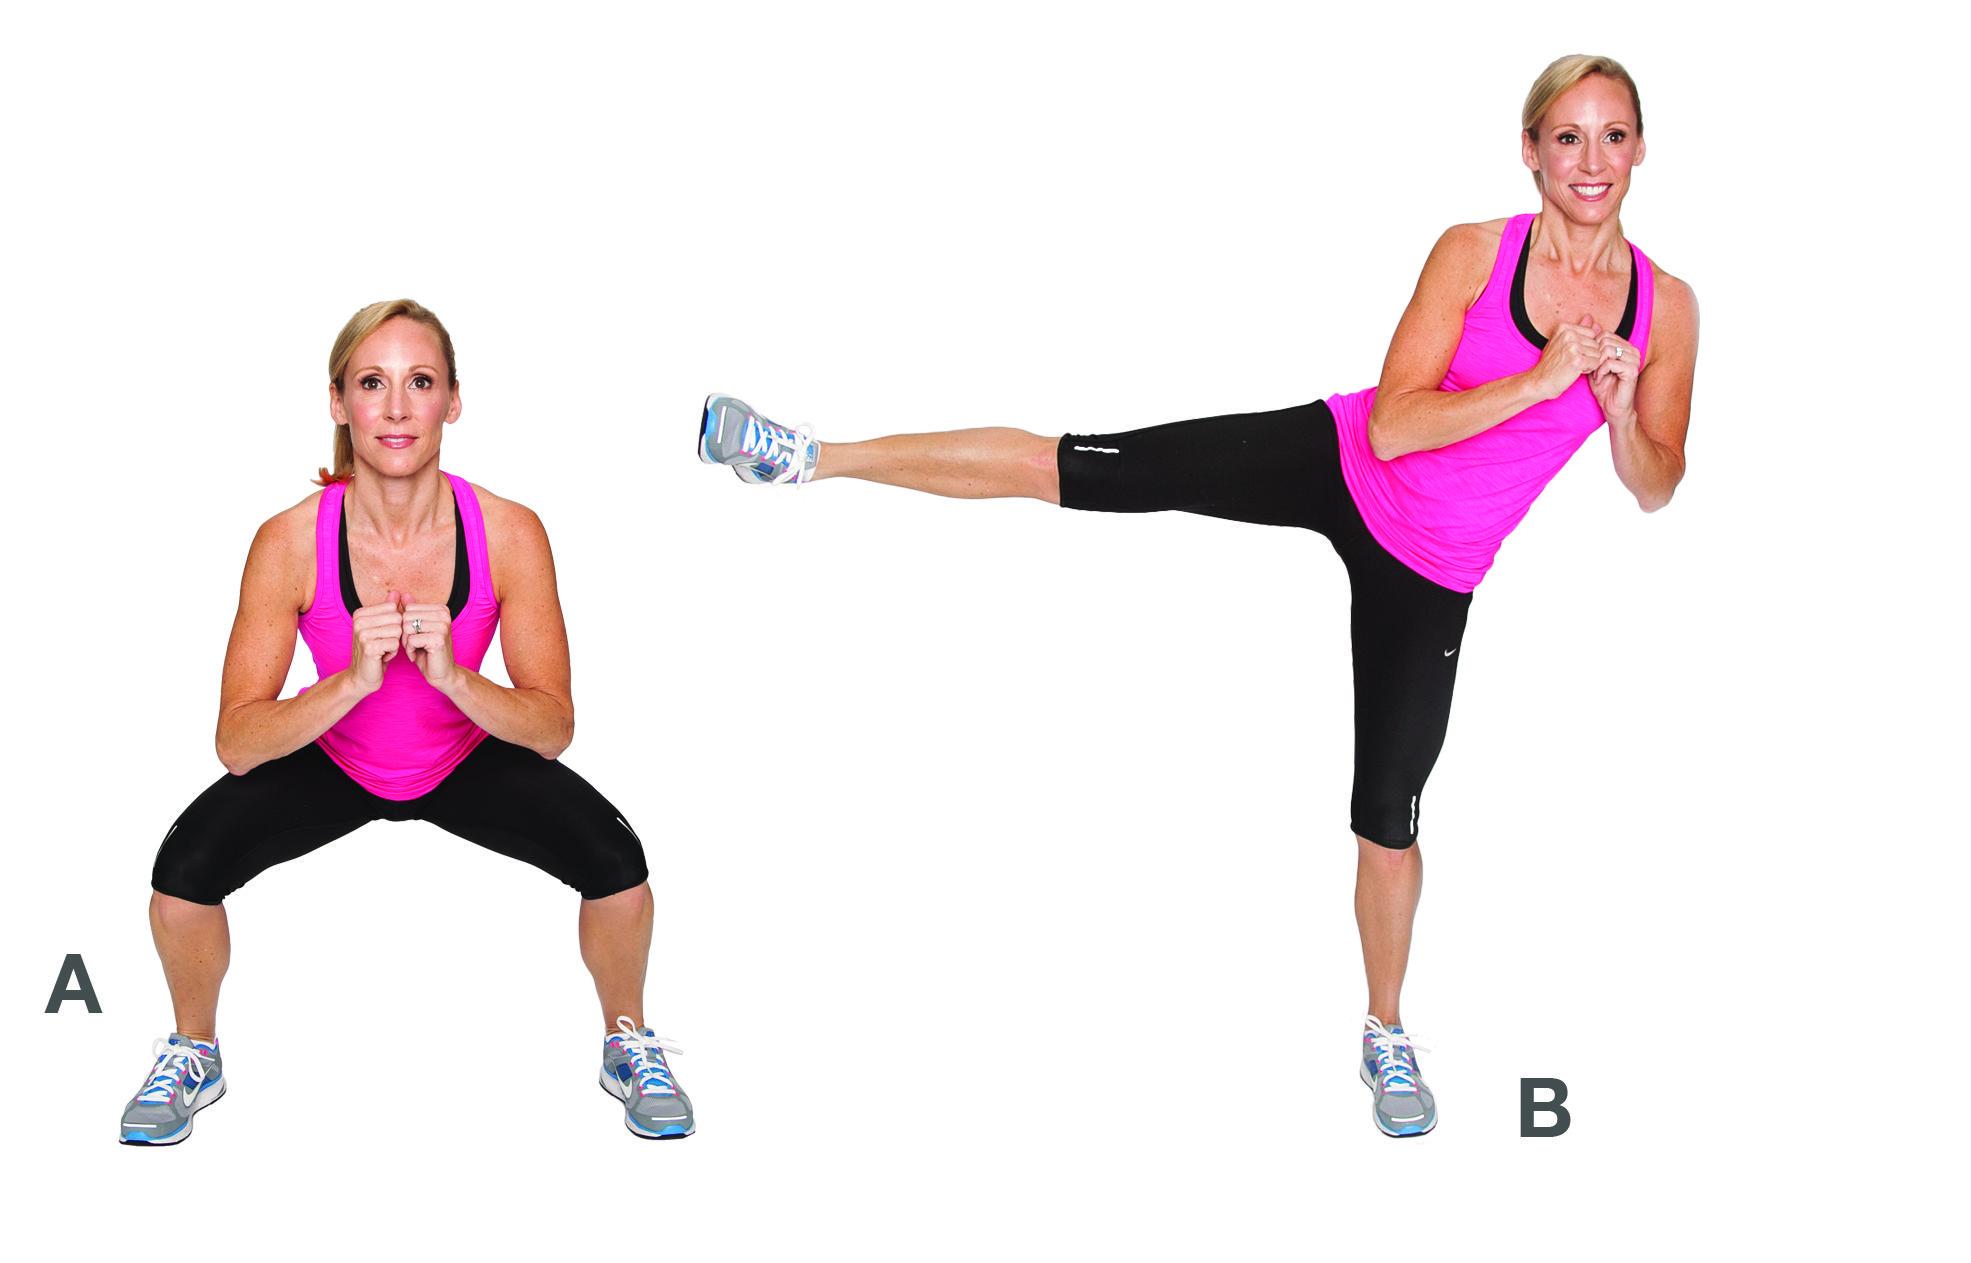 6. Squats with Side Kicks